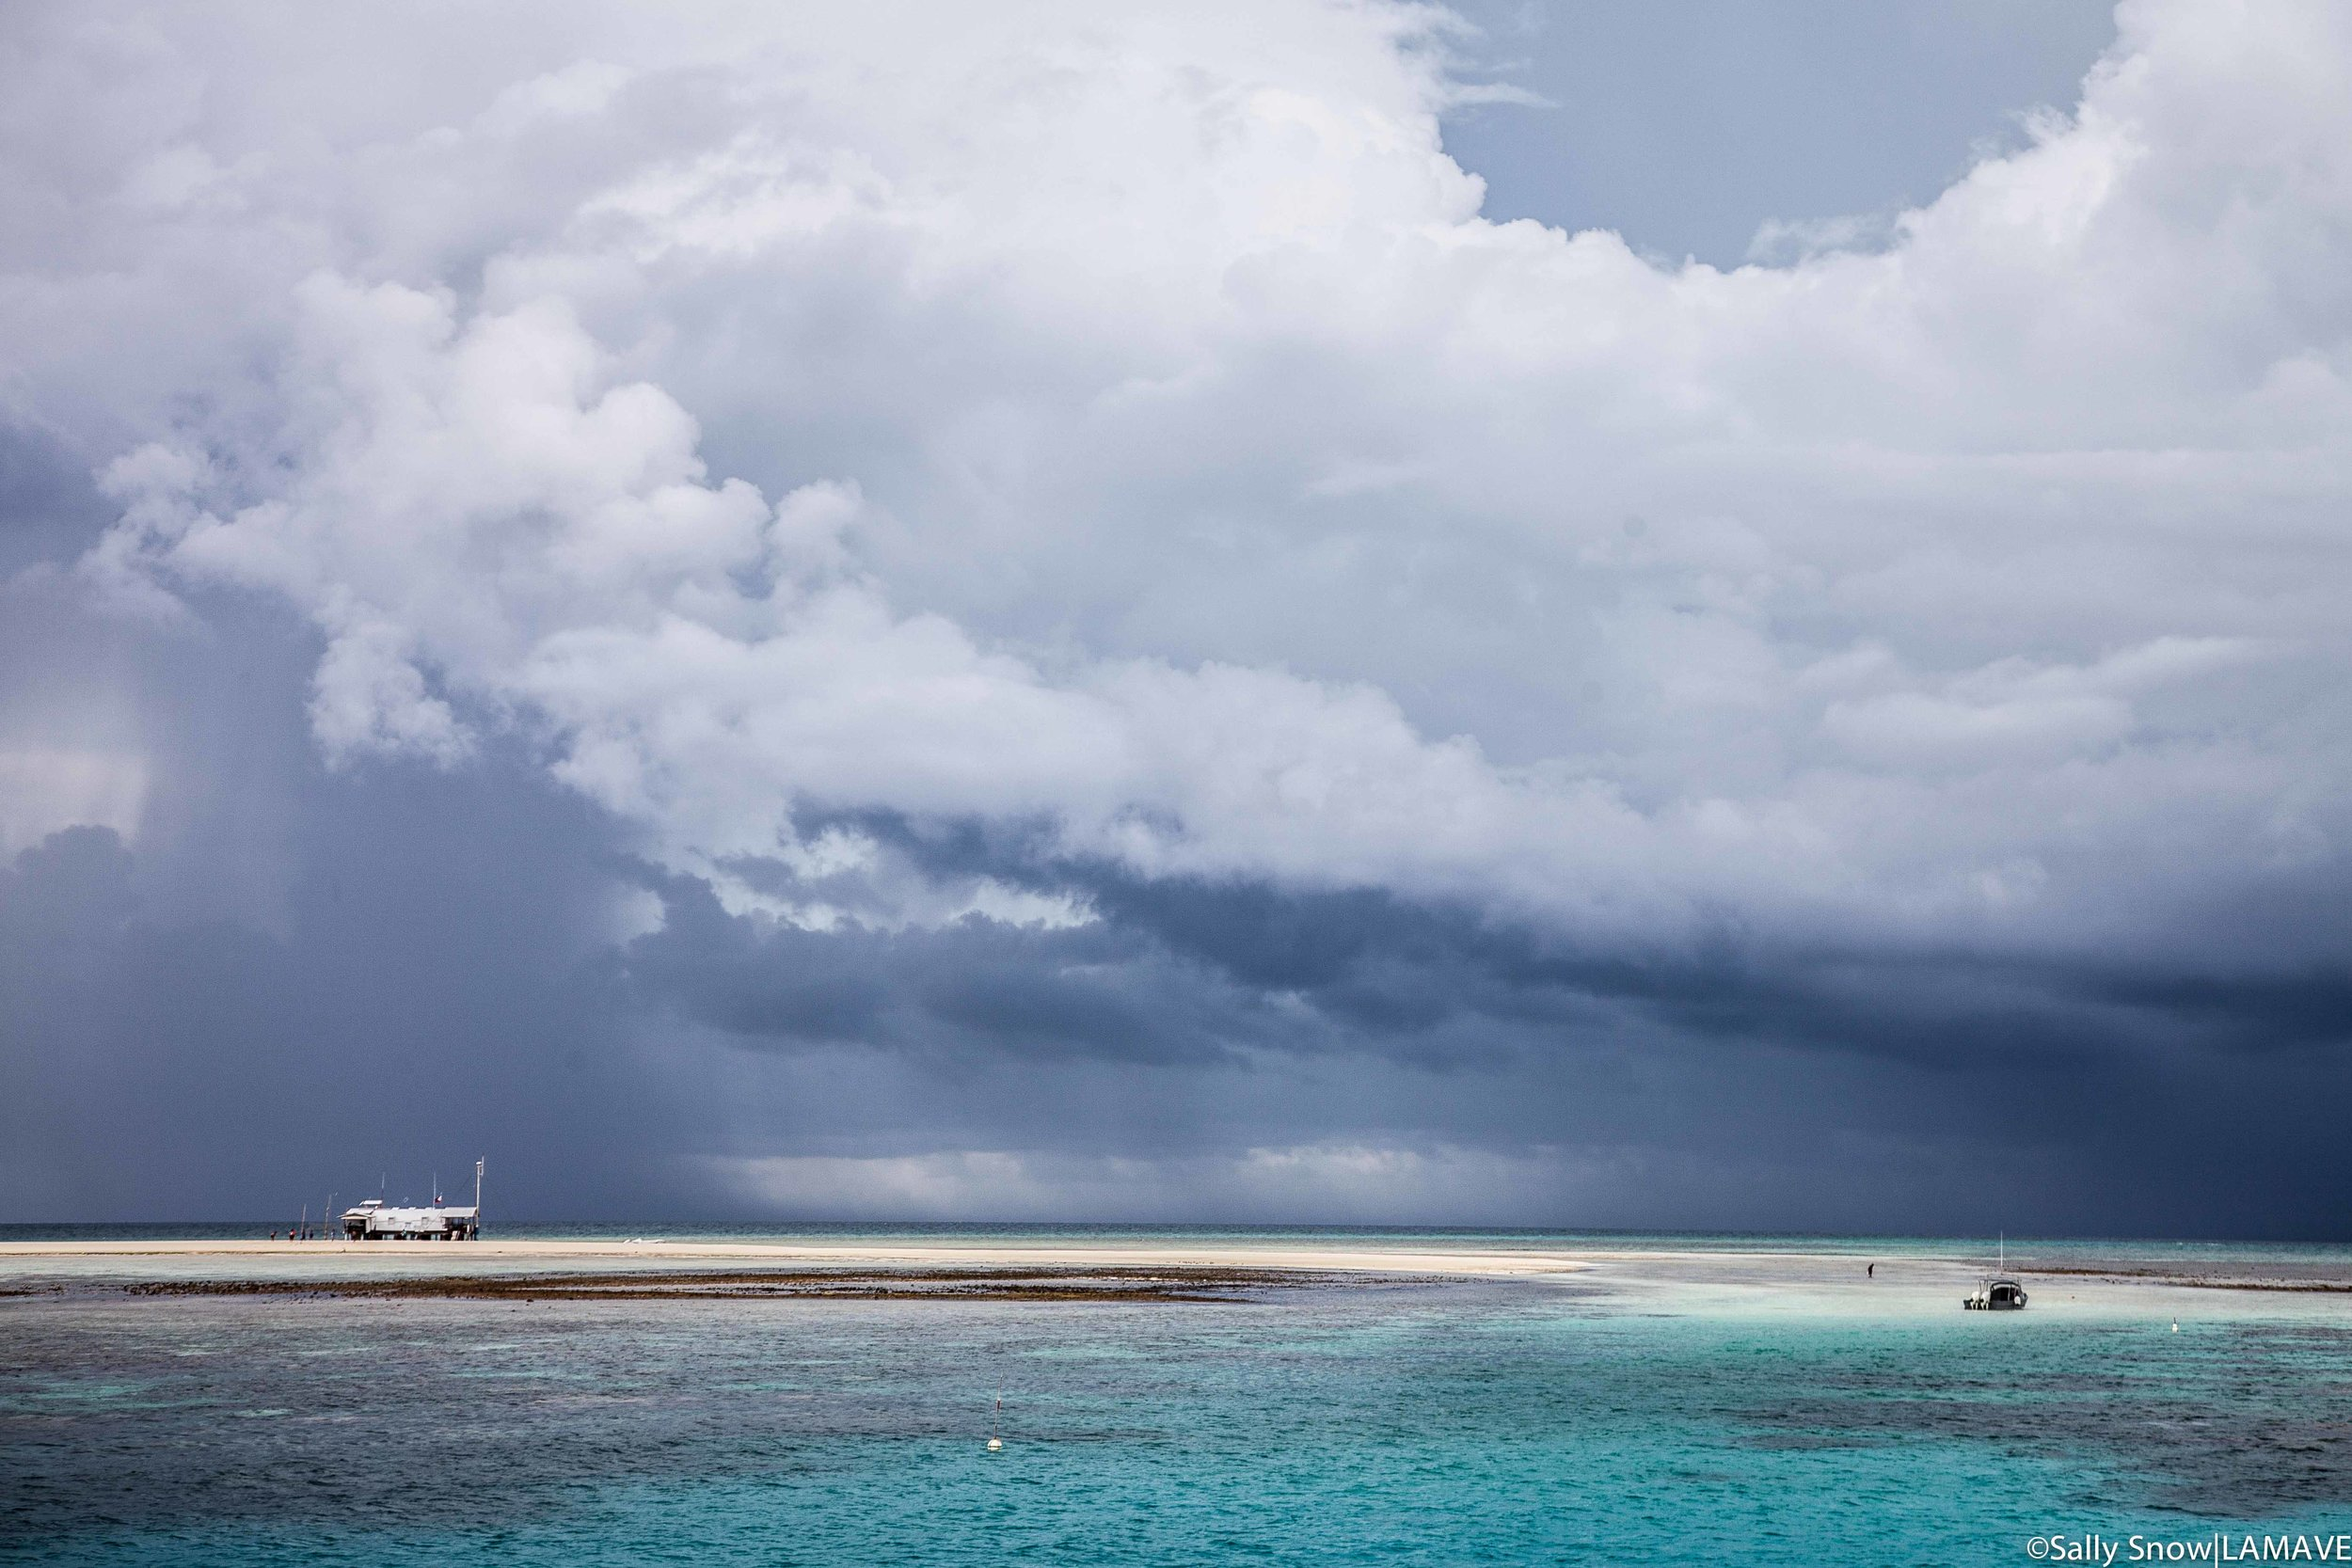 ranger-station-tubbataha-reefs-credit-sally-snow-LAMAVE-8.jpg